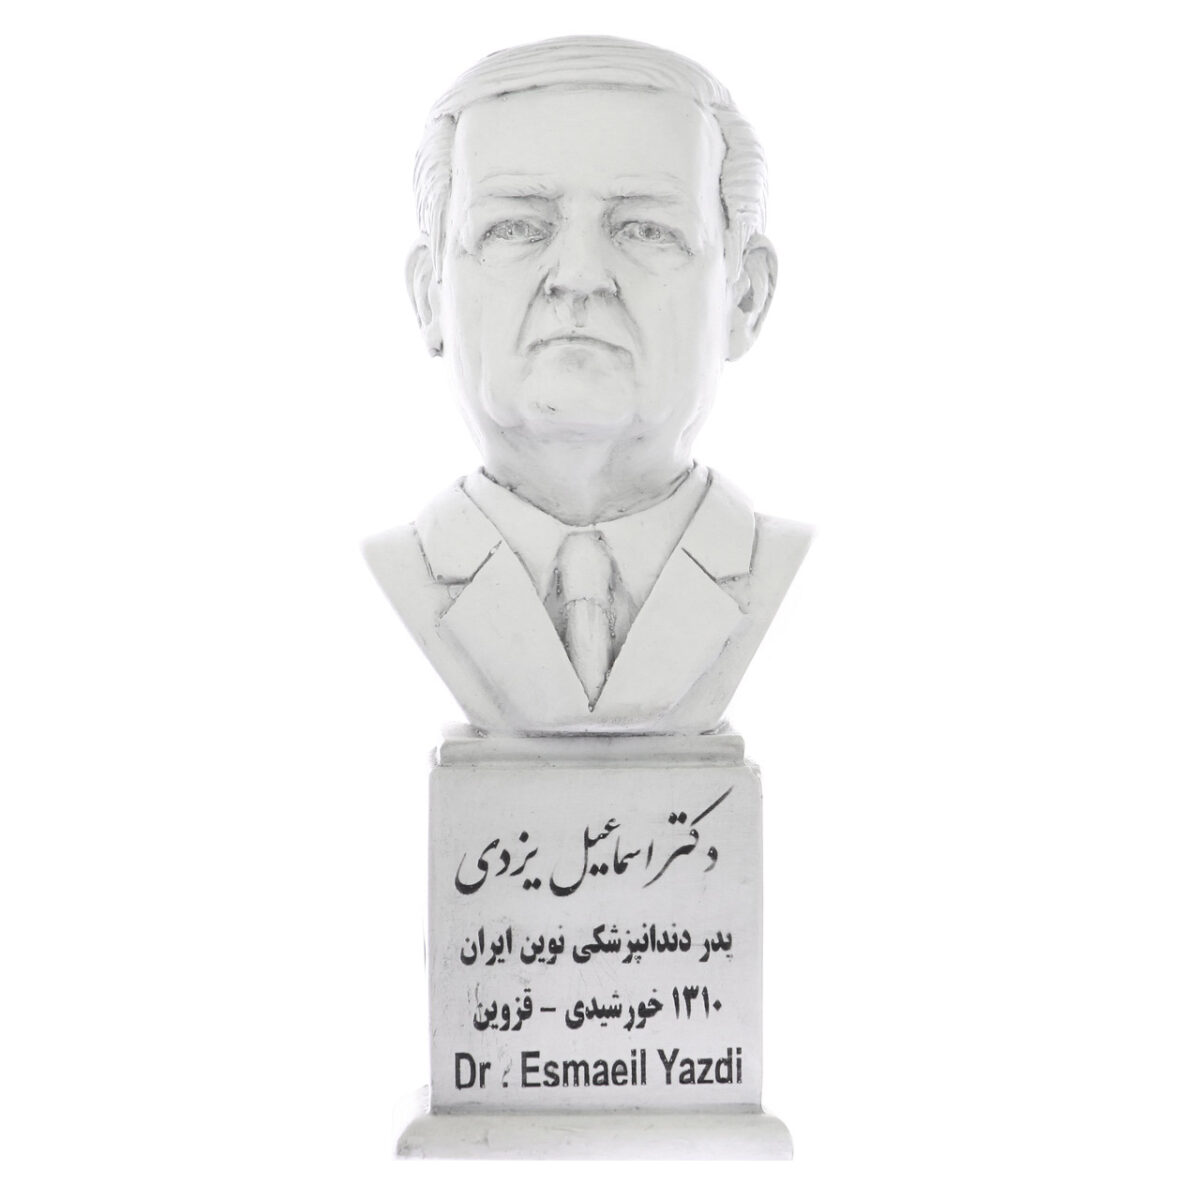 dr esmaeil yazdi s 1200x1200 - سردیس دکتر اسماعیل یزدی